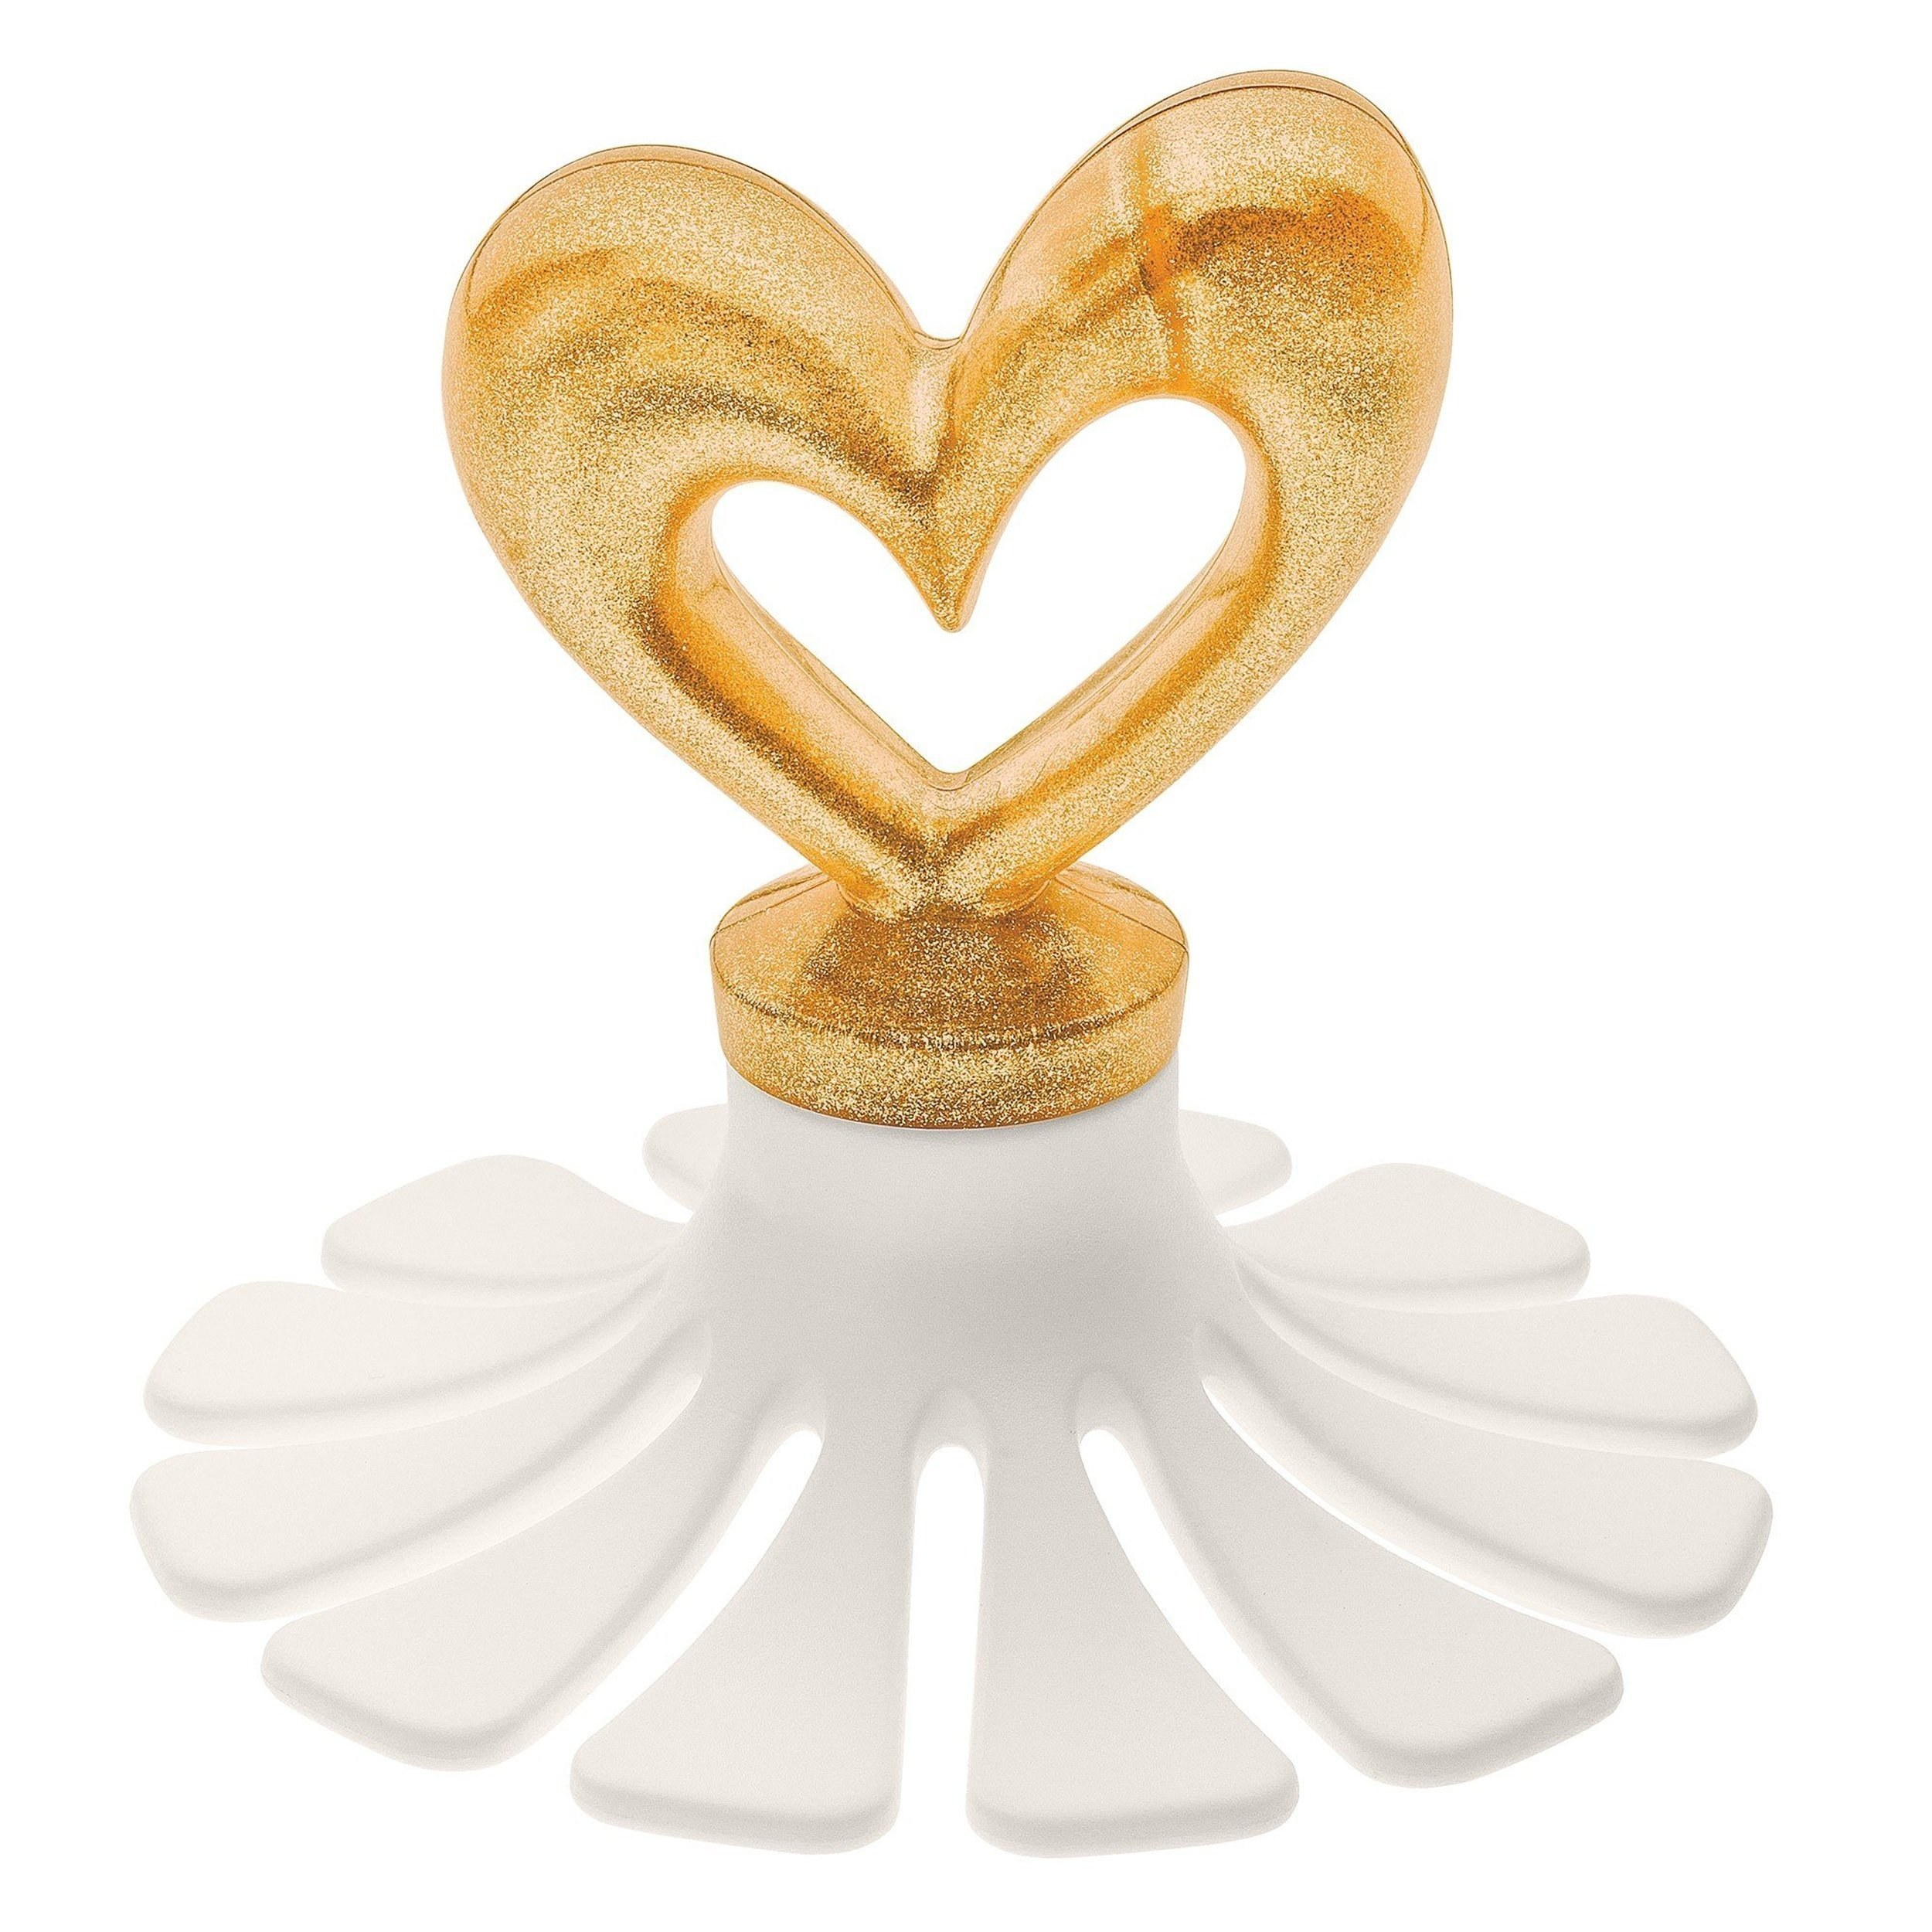 Akcesorium do porcjowania ciasta Susi golden pearl